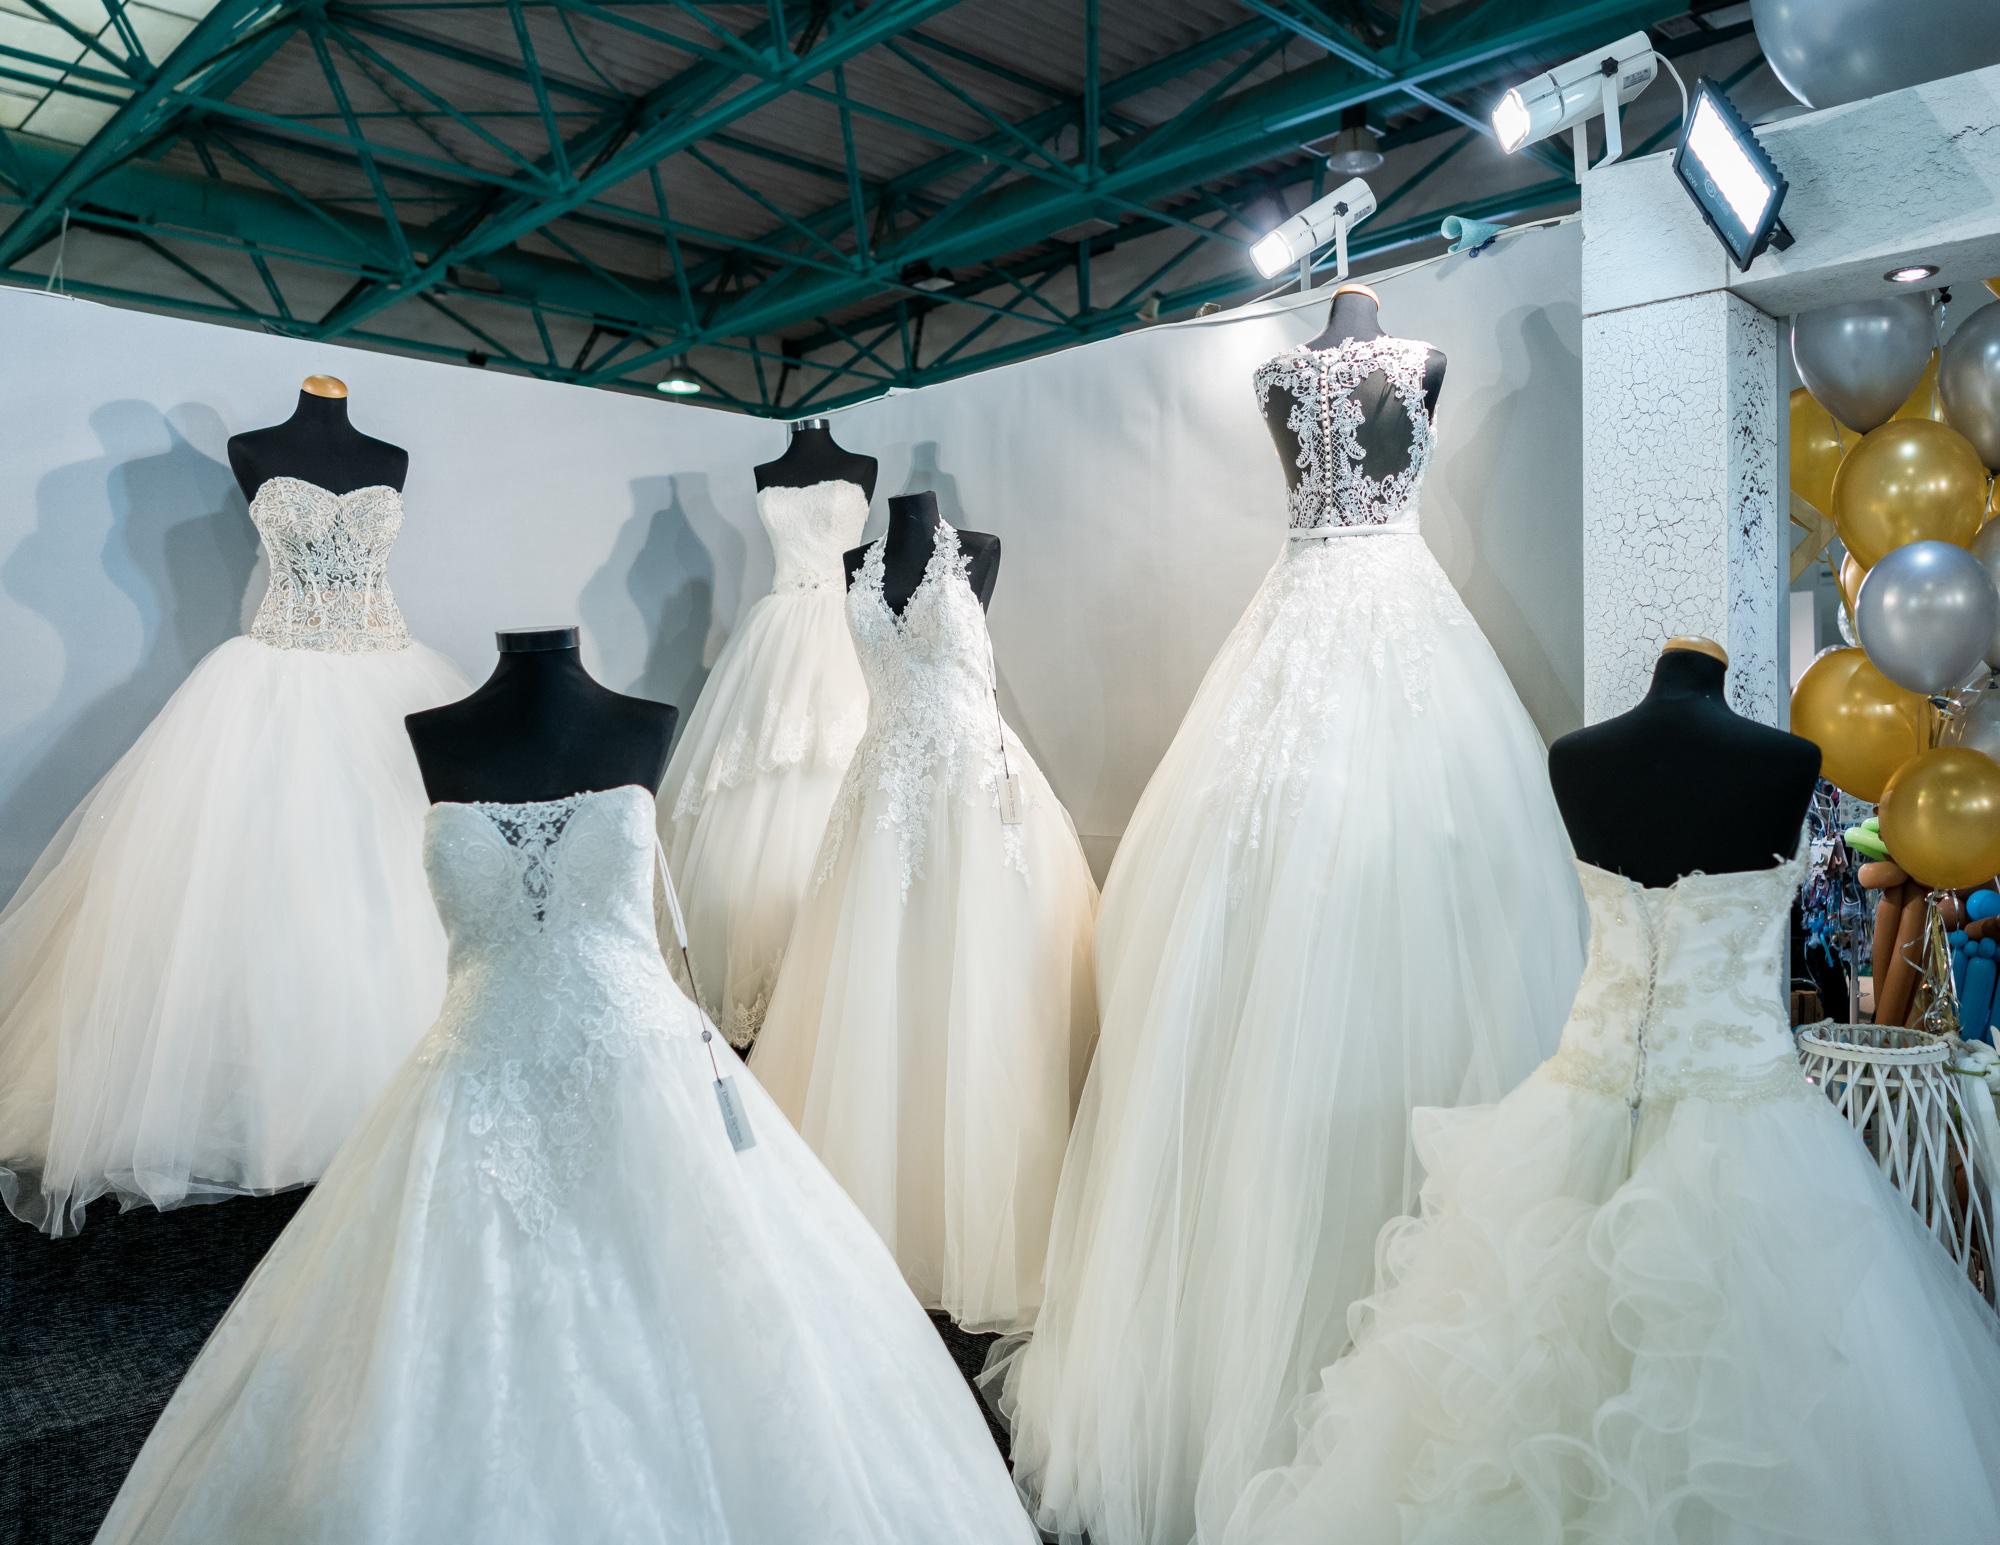 1d38469cafd Προσπάθησα όμως να βρω πόσο θα στοίχιζε σε ένα ζευγάρι ένας γάμος στις  ημέρες μας και παράλληλα πώς έχει επηρεάσει τη βιομηχανία ...